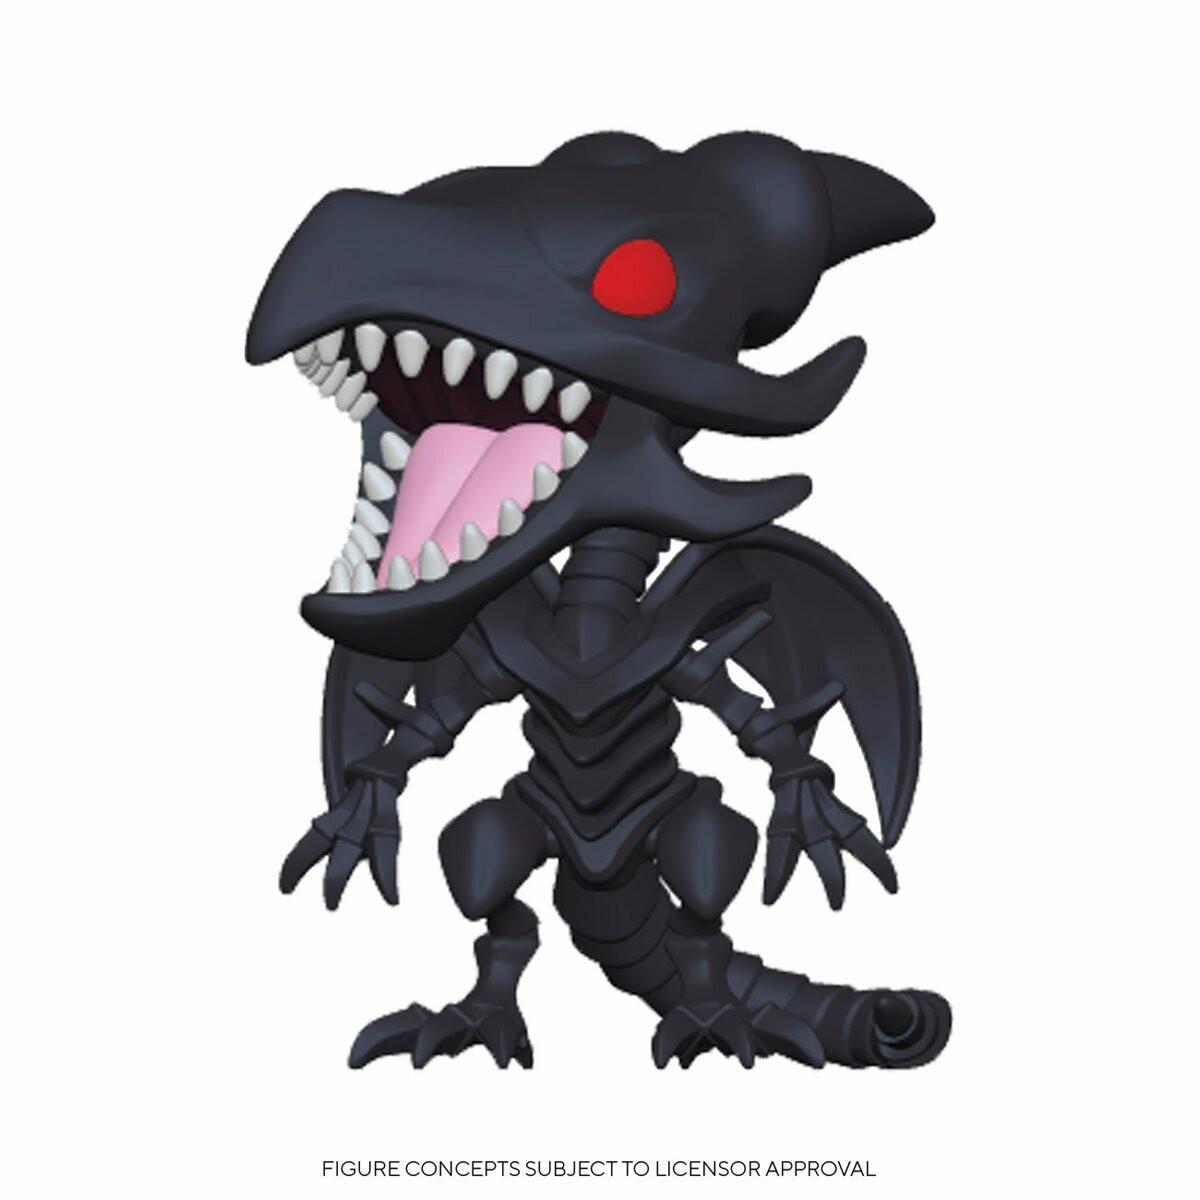 PRE-ORDER Yu-Gi-Oh Red-Eyes Black Dragon Pop! Vinyl Figure